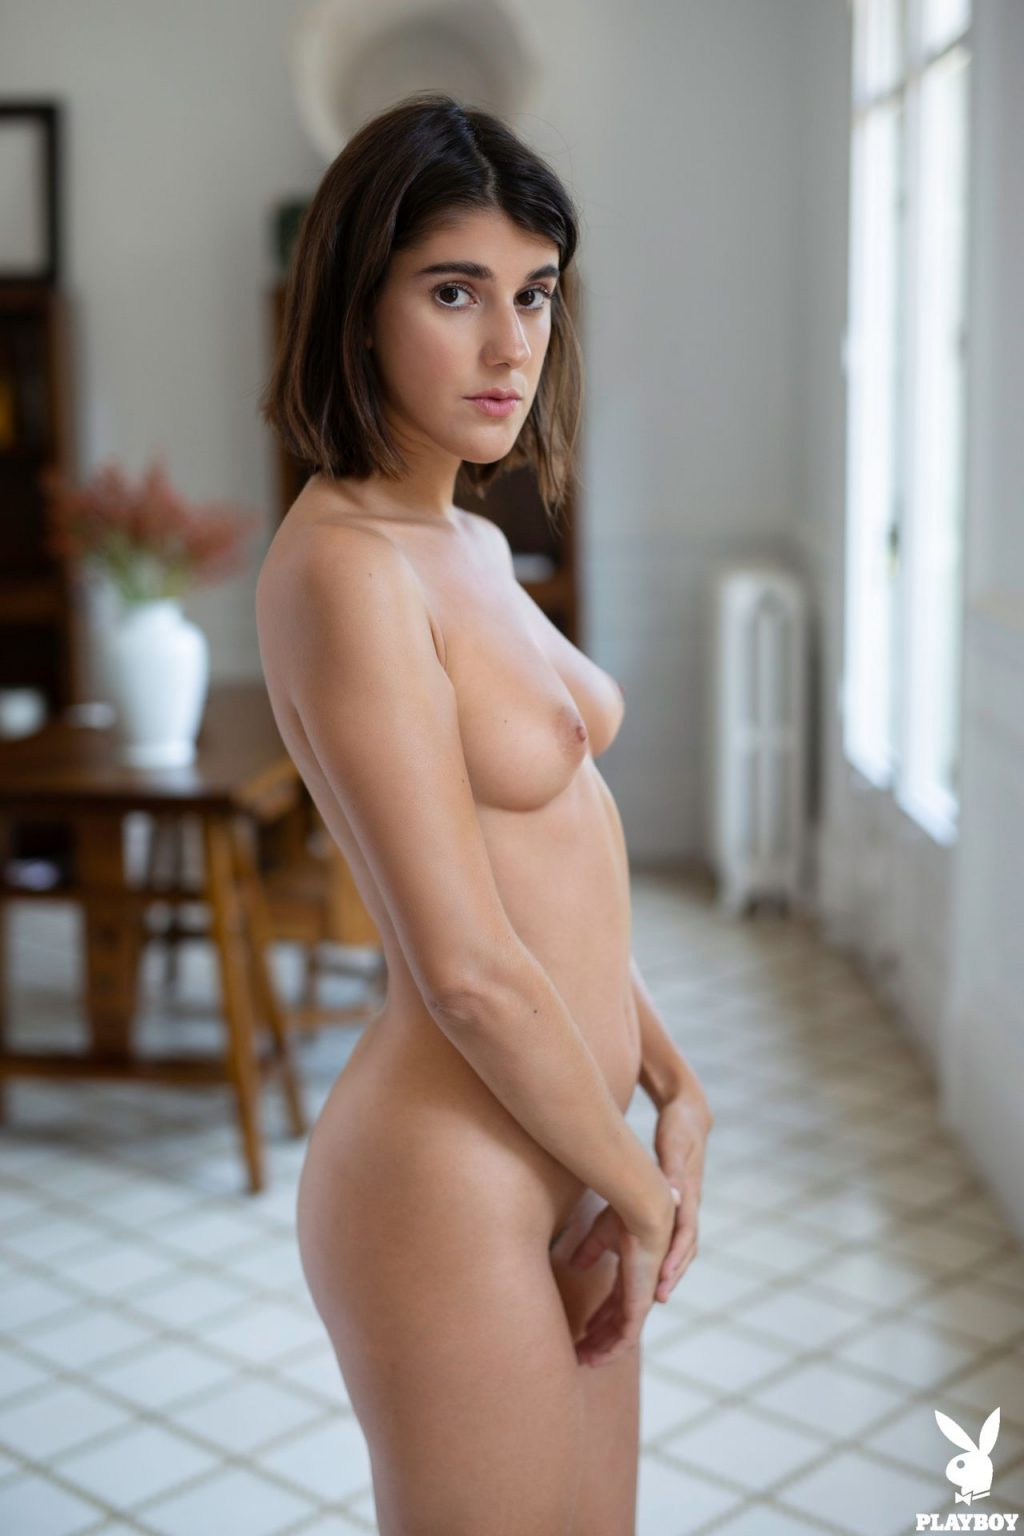 Angela Vazquez Nude ana maria nude – #thefappening